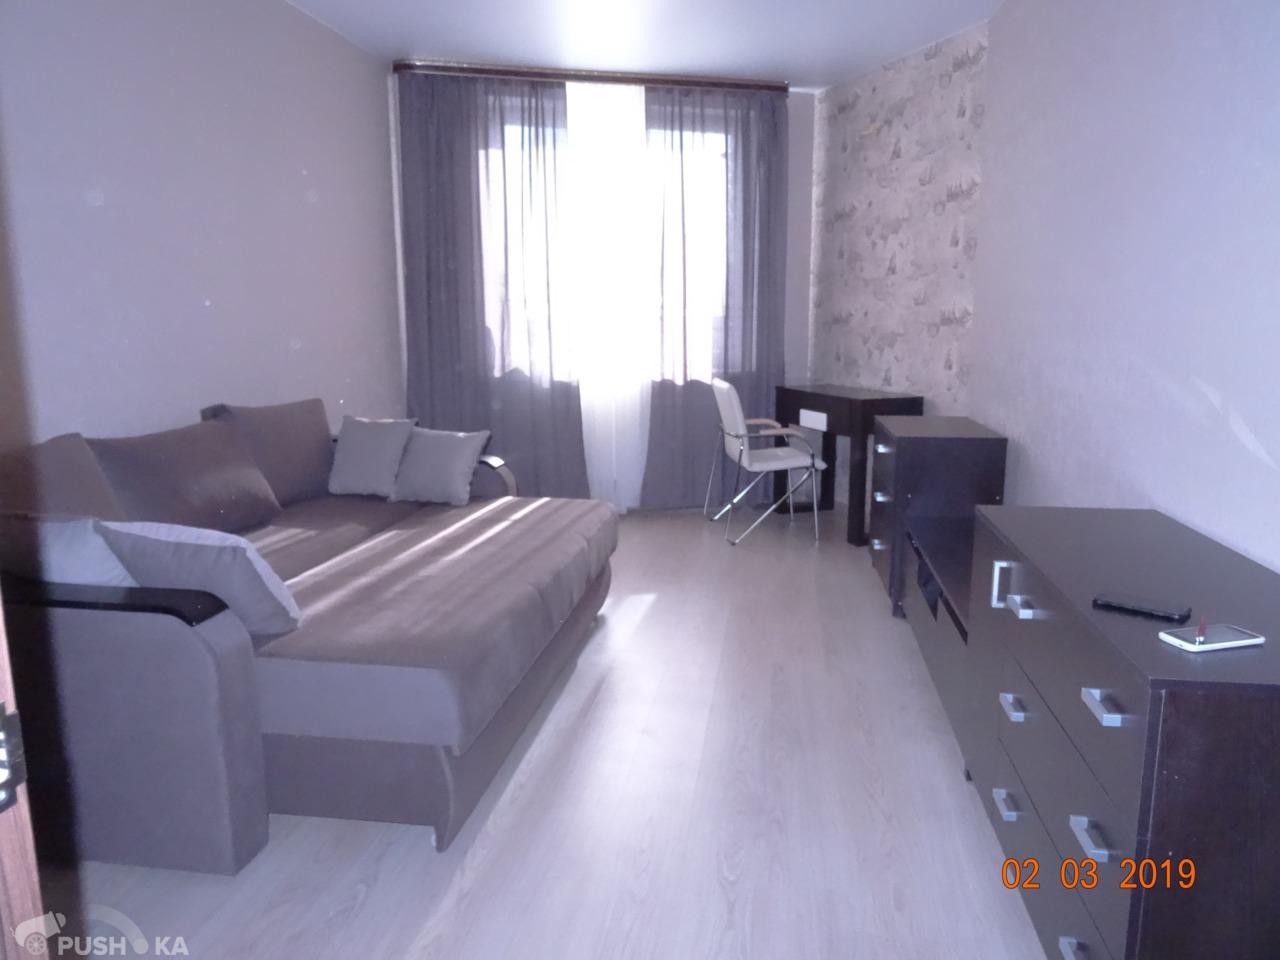 Сдаётся 1-комнатная квартира 40.5 кв.м. этаж 11/17 за 29 000 руб